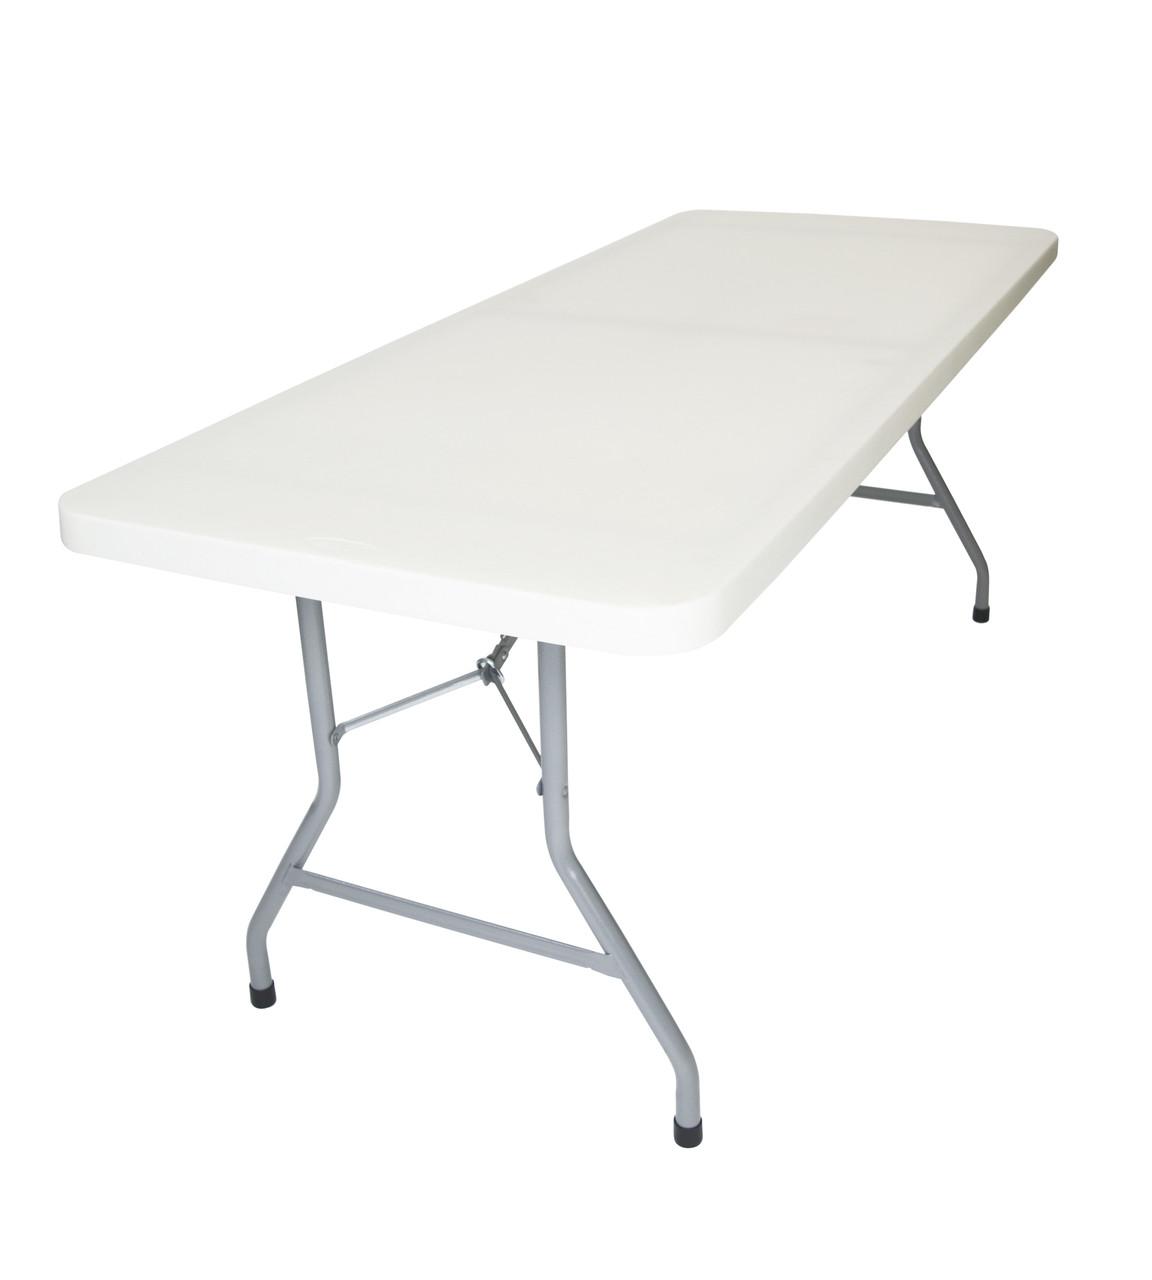 Rhino Lite 30x96 8 Ft Rectangle Plastic Folding Table Solid One Piece Top Locking Steel Frame Foldingchairsandtables Com